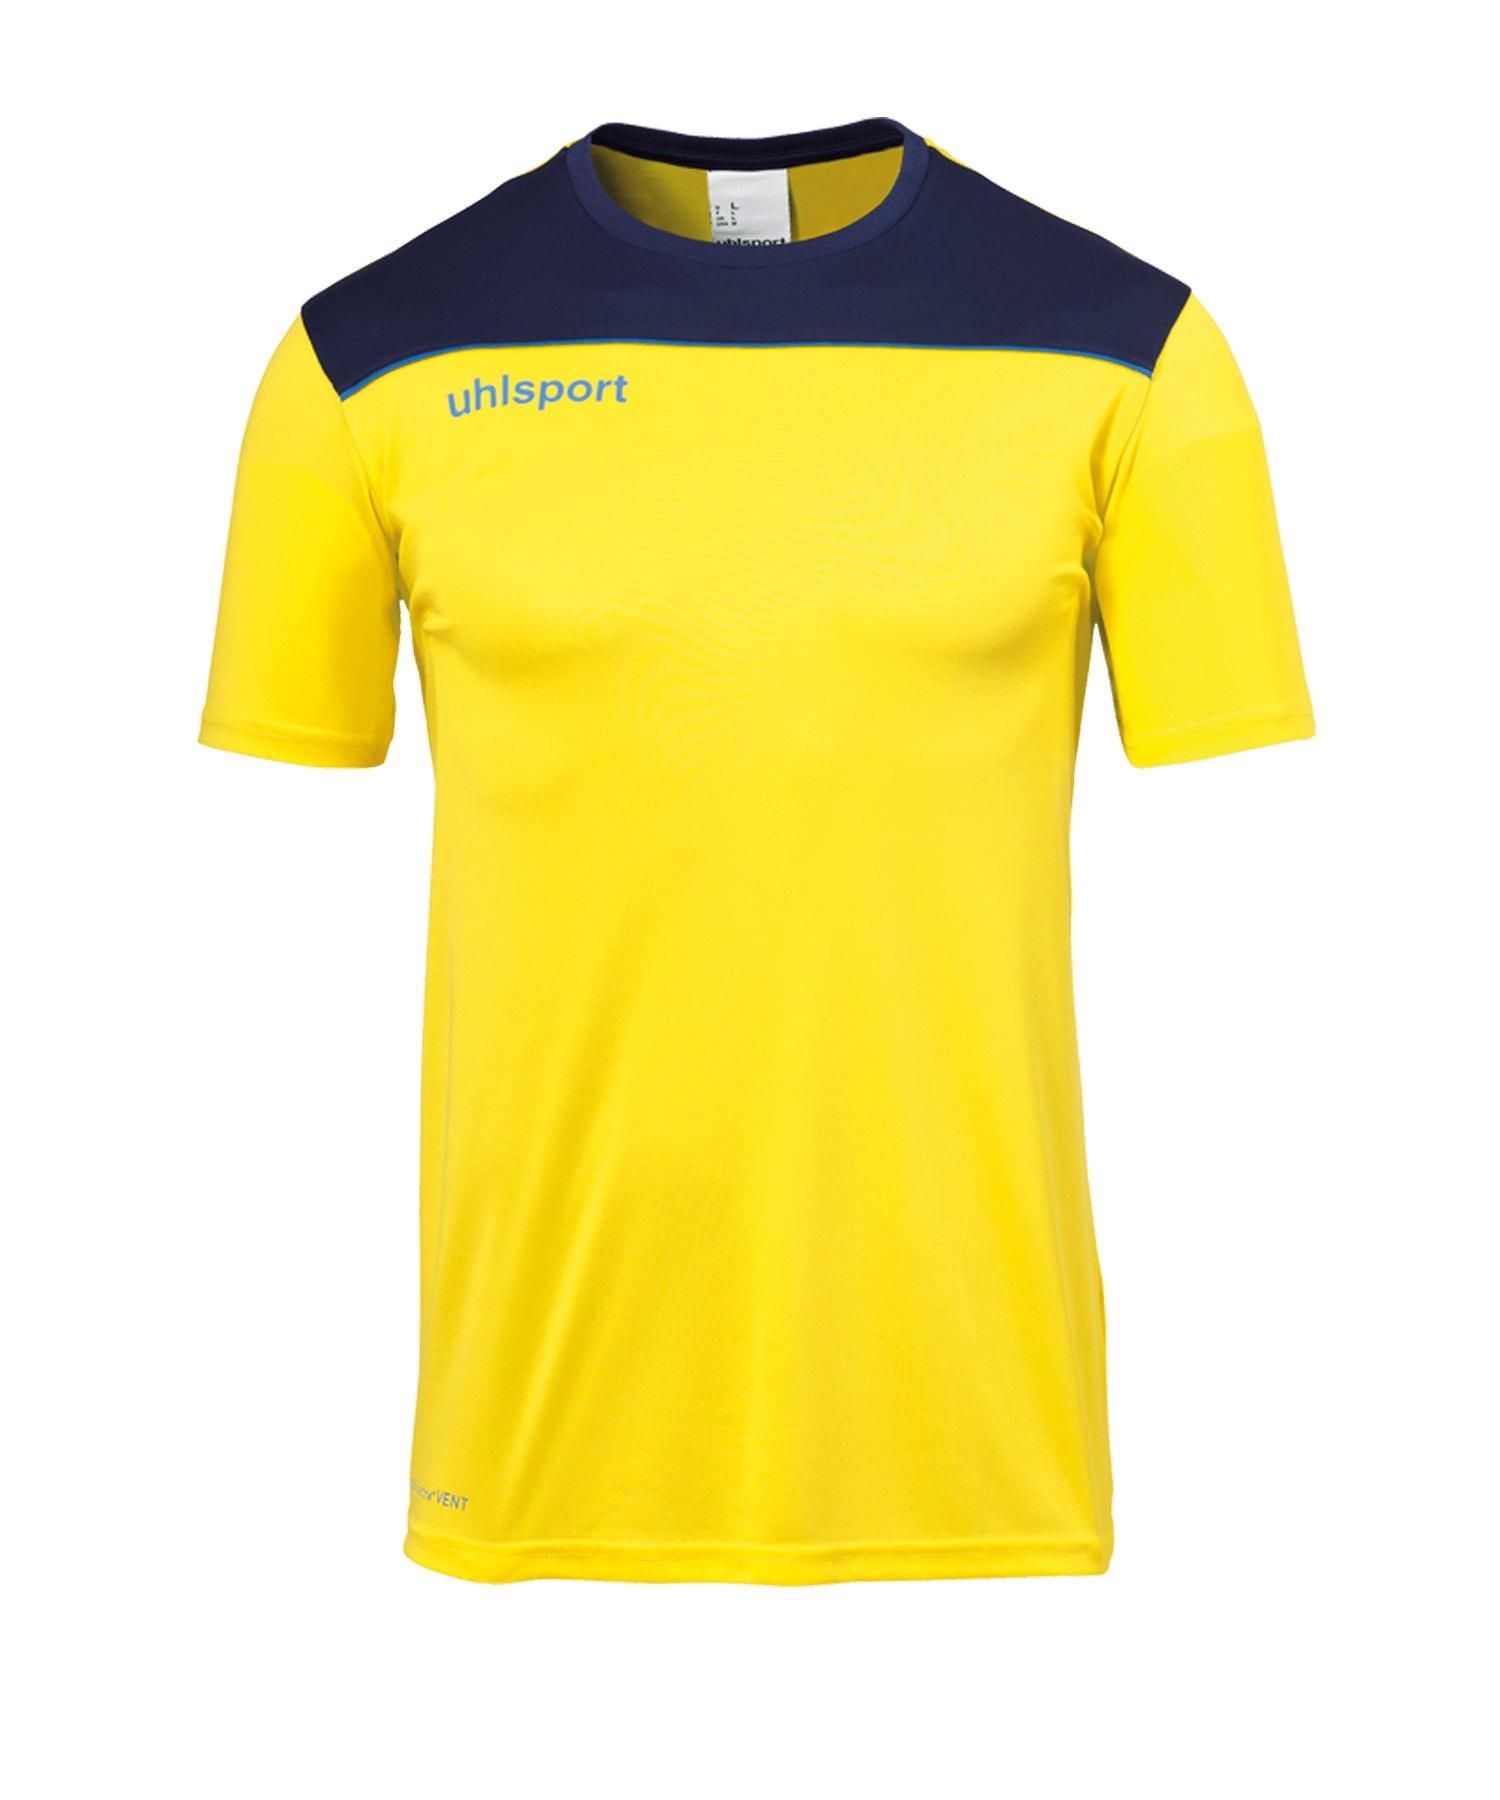 Uhlsport Offense 23 Trainingsshirt Kids Gelb F11 - gelb